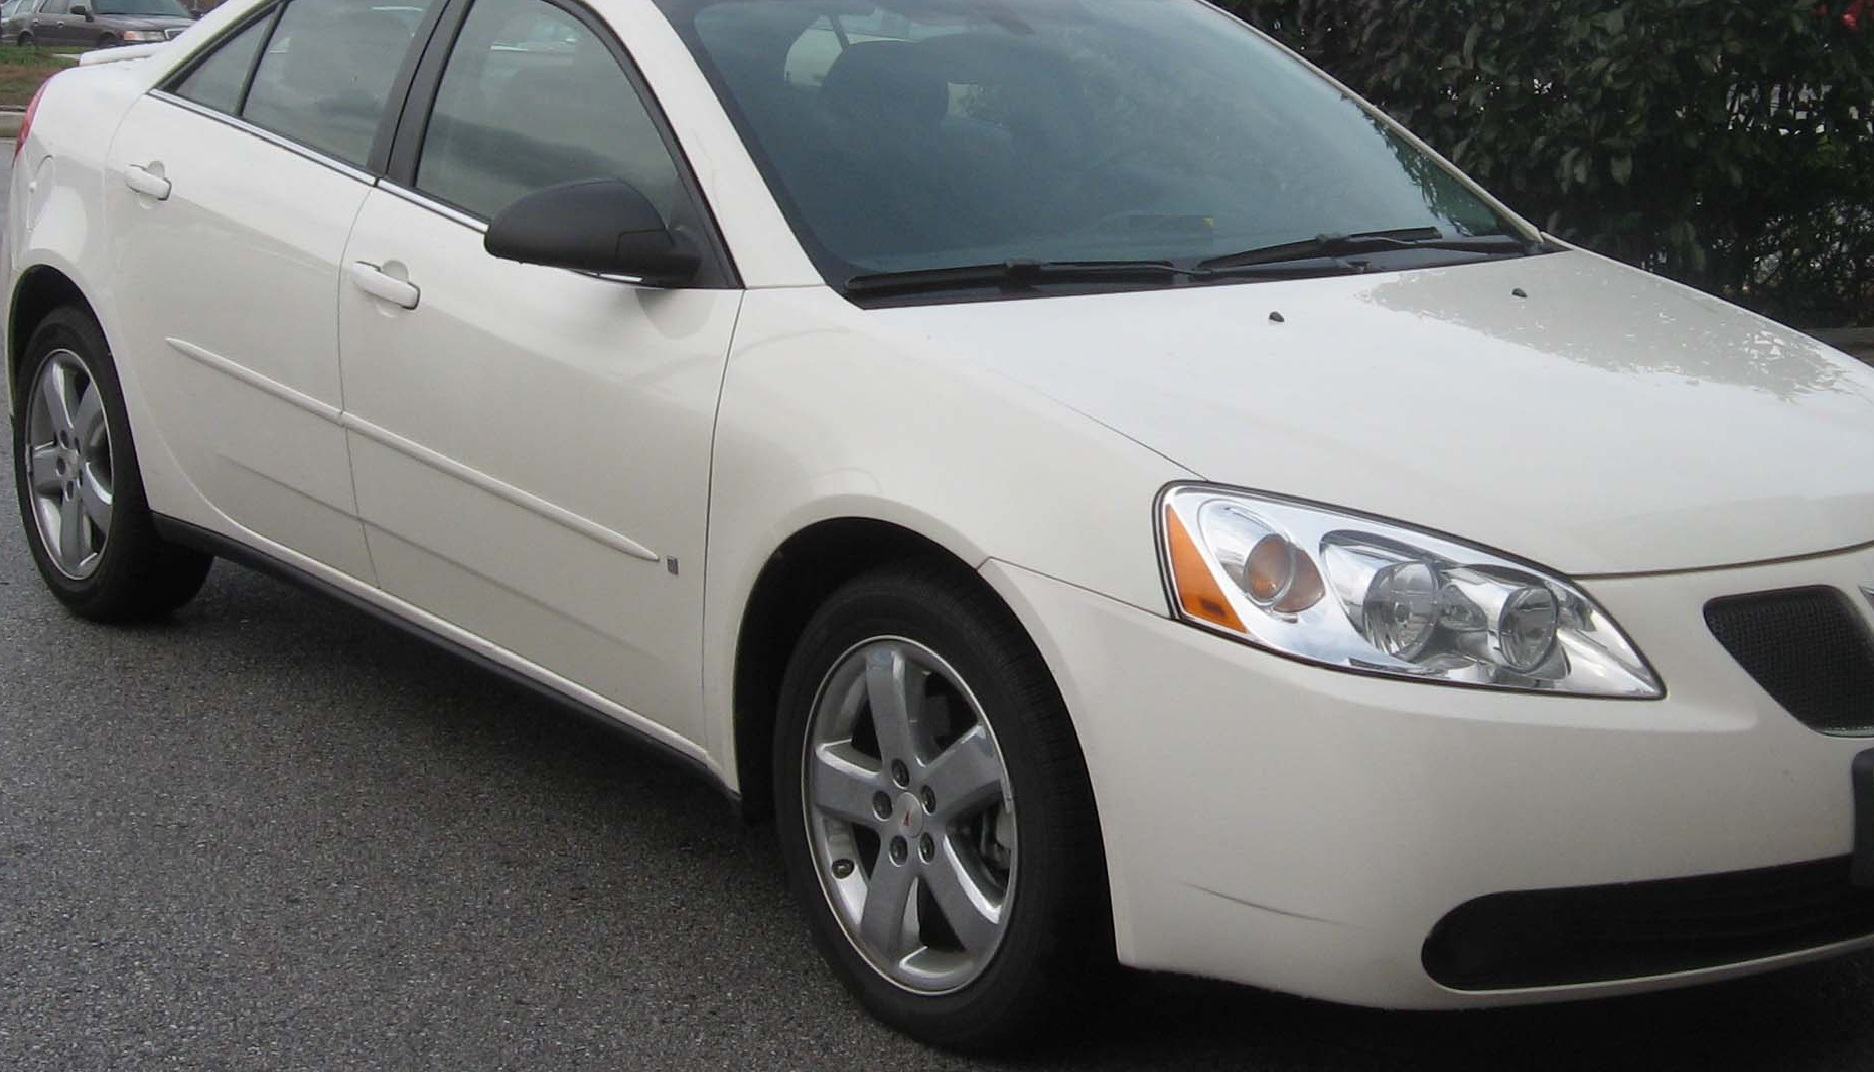 Theft of Running Cars in Murfreesboro, two